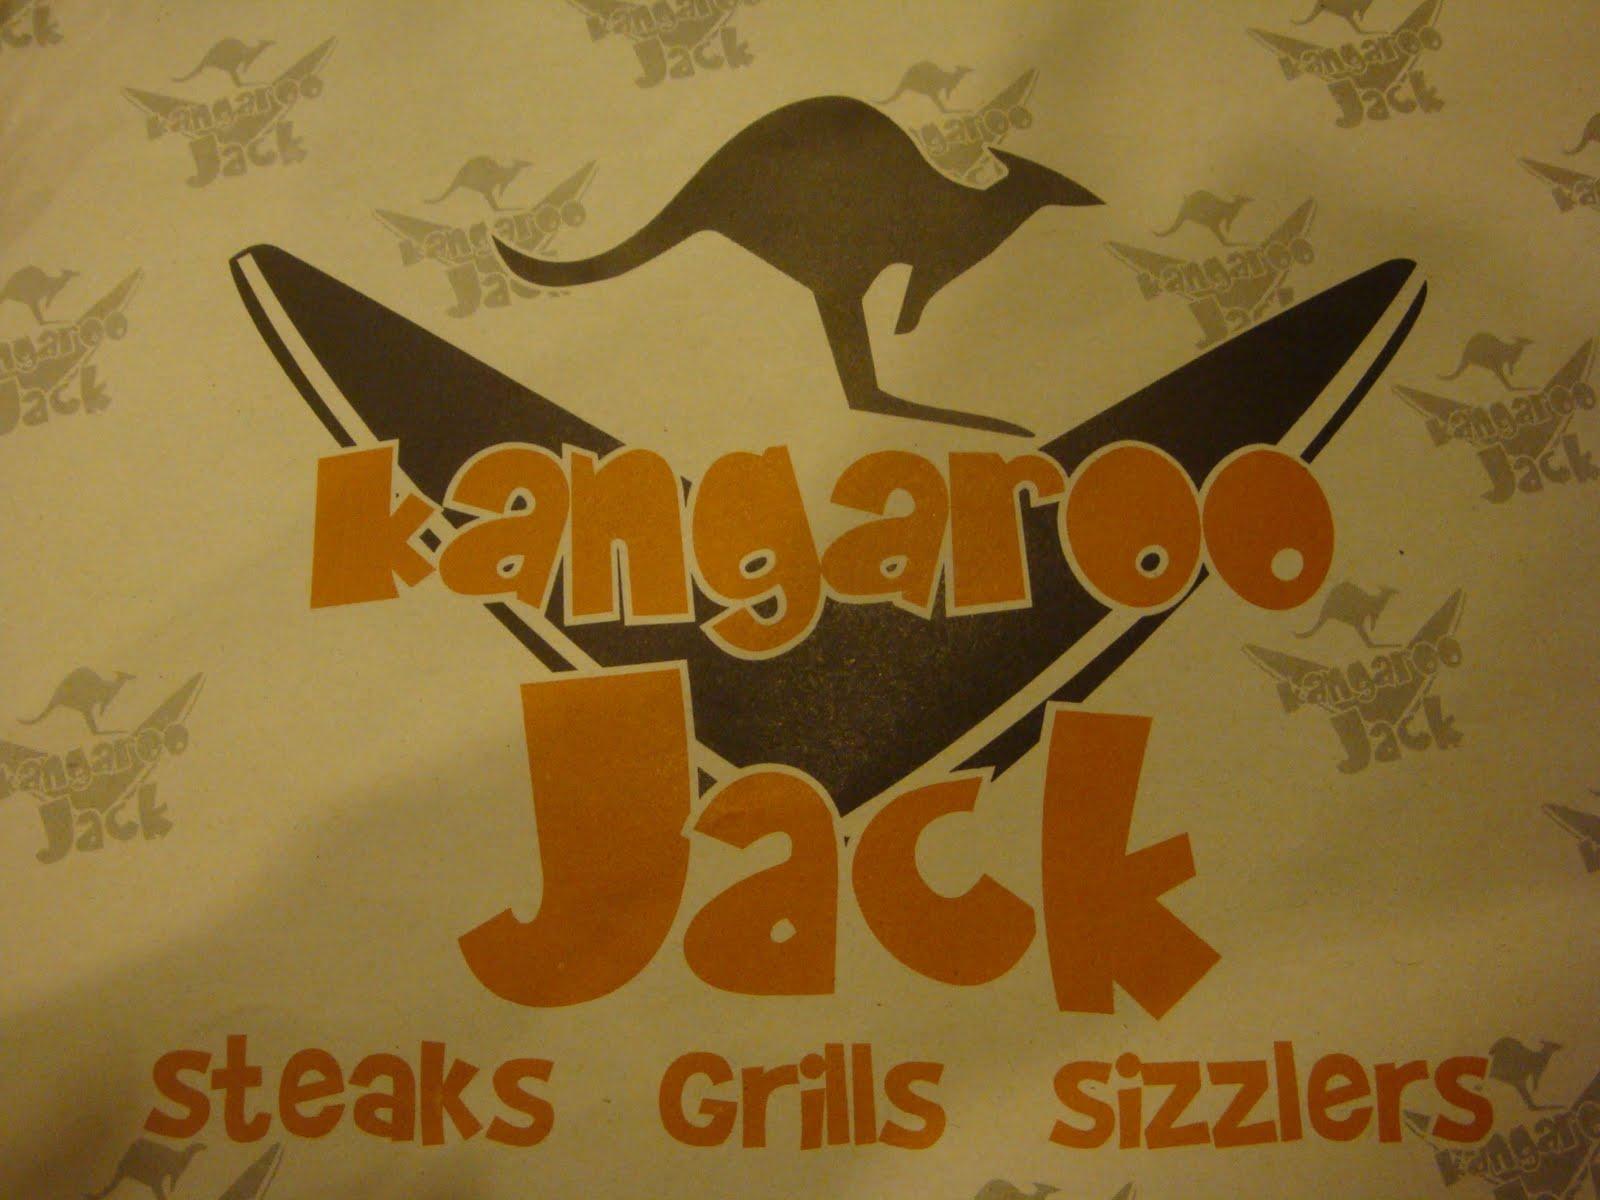 Kangaroo Jack Restaurant Sm North Edsa